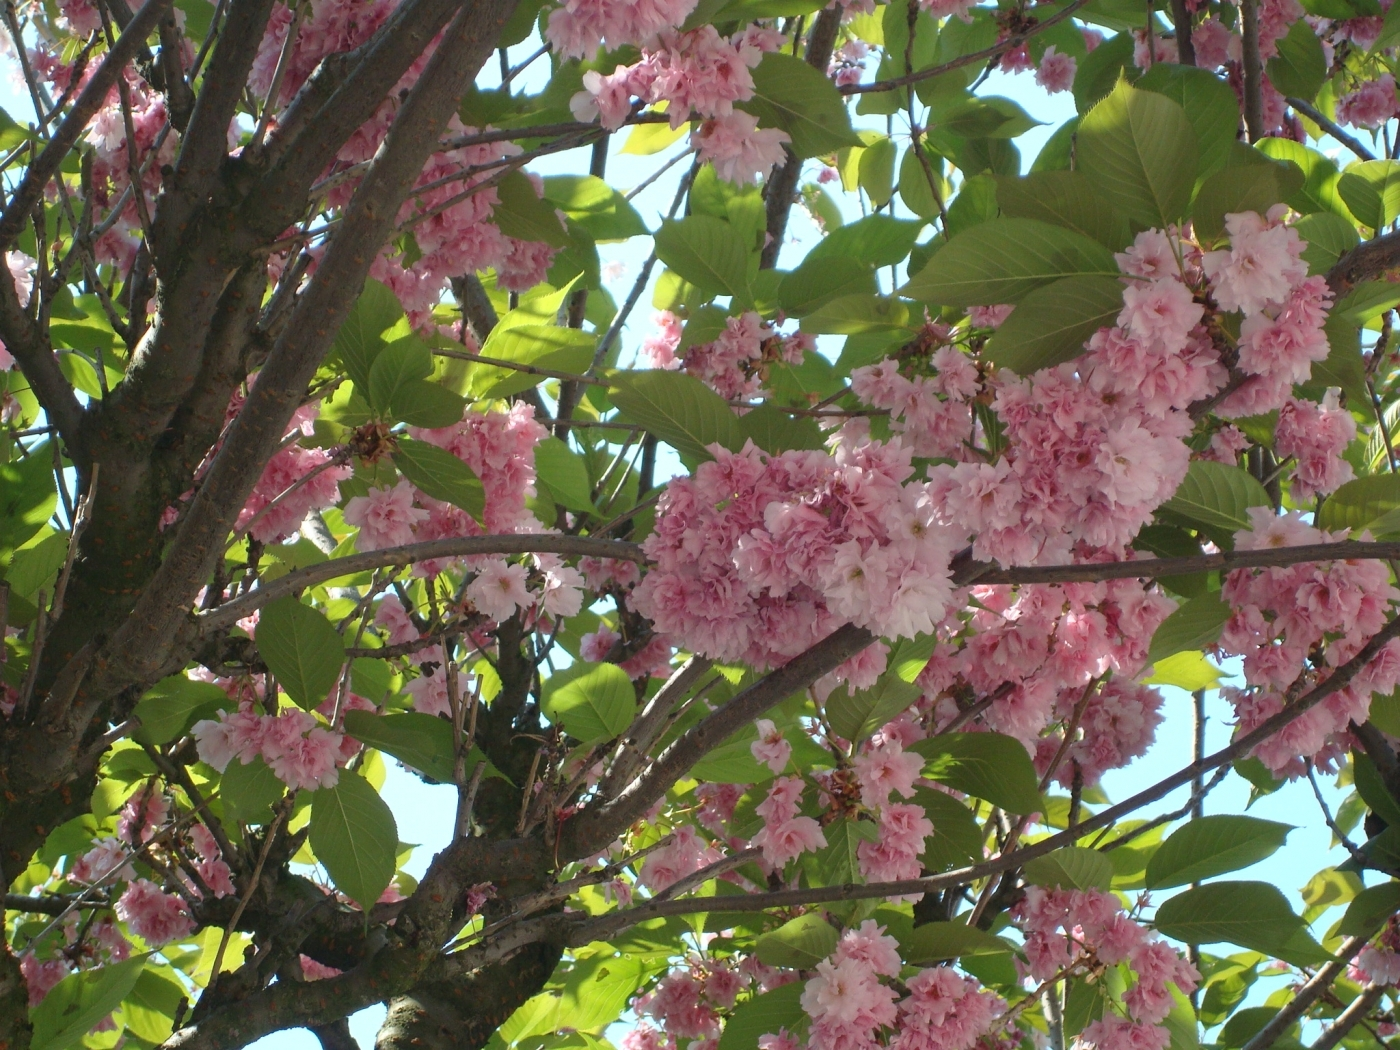 23368 descargar fondo de pantalla Plantas, Flores, Árboles: protectores de pantalla e imágenes gratis